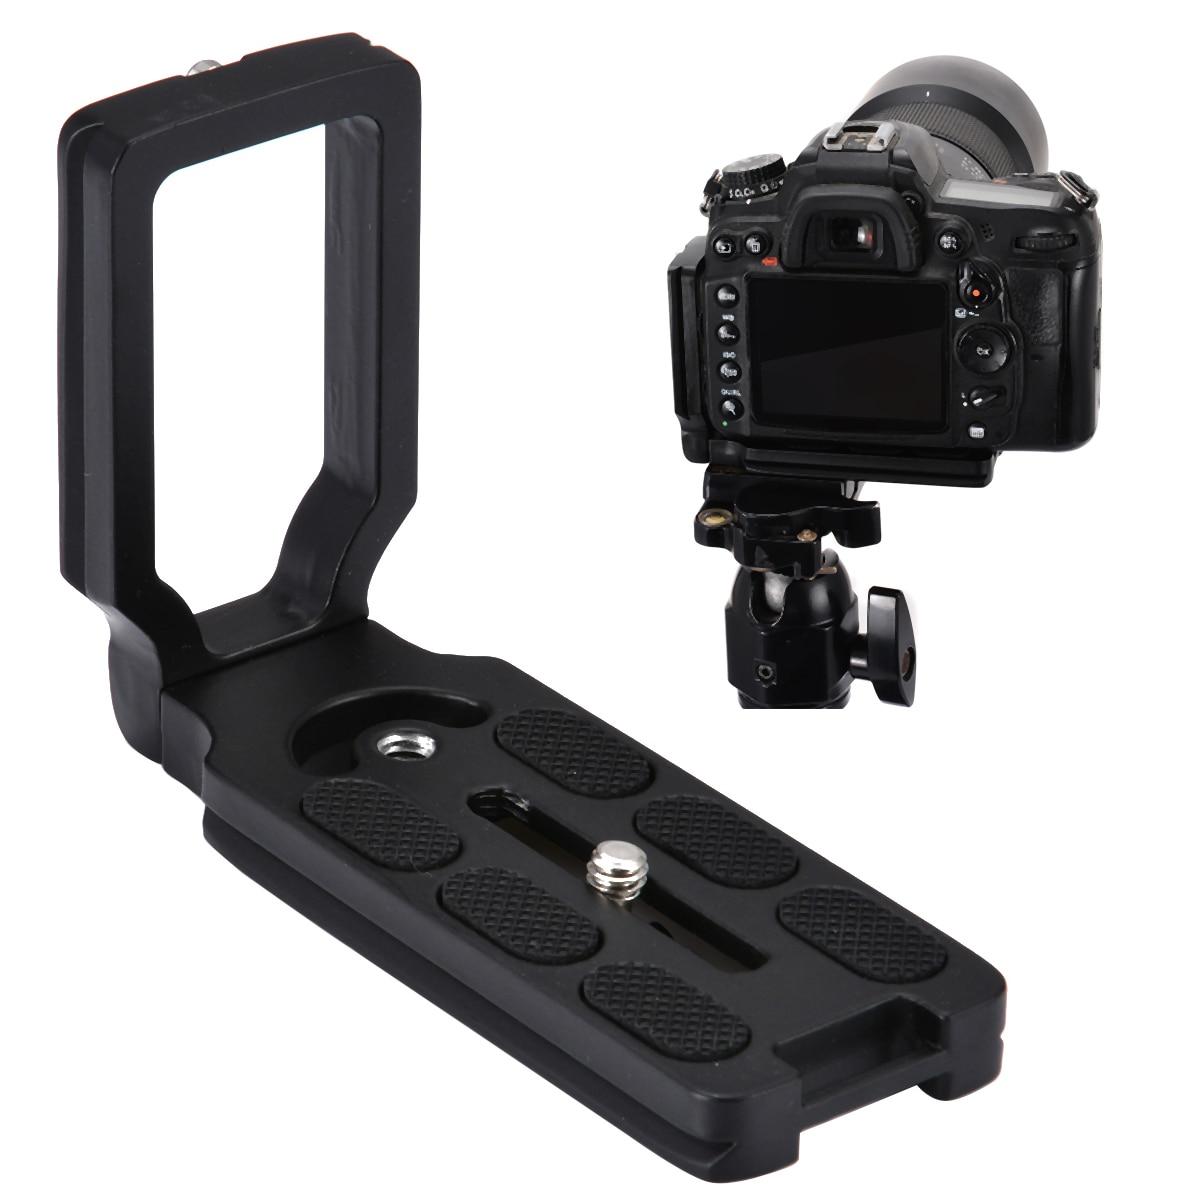 Onsale 1pc Aluminum Alloy L Plate Quick Release L Plate Bracket With Screw For Nikon D7200 D800 D750 D5500 D3300 D810a Mayitr